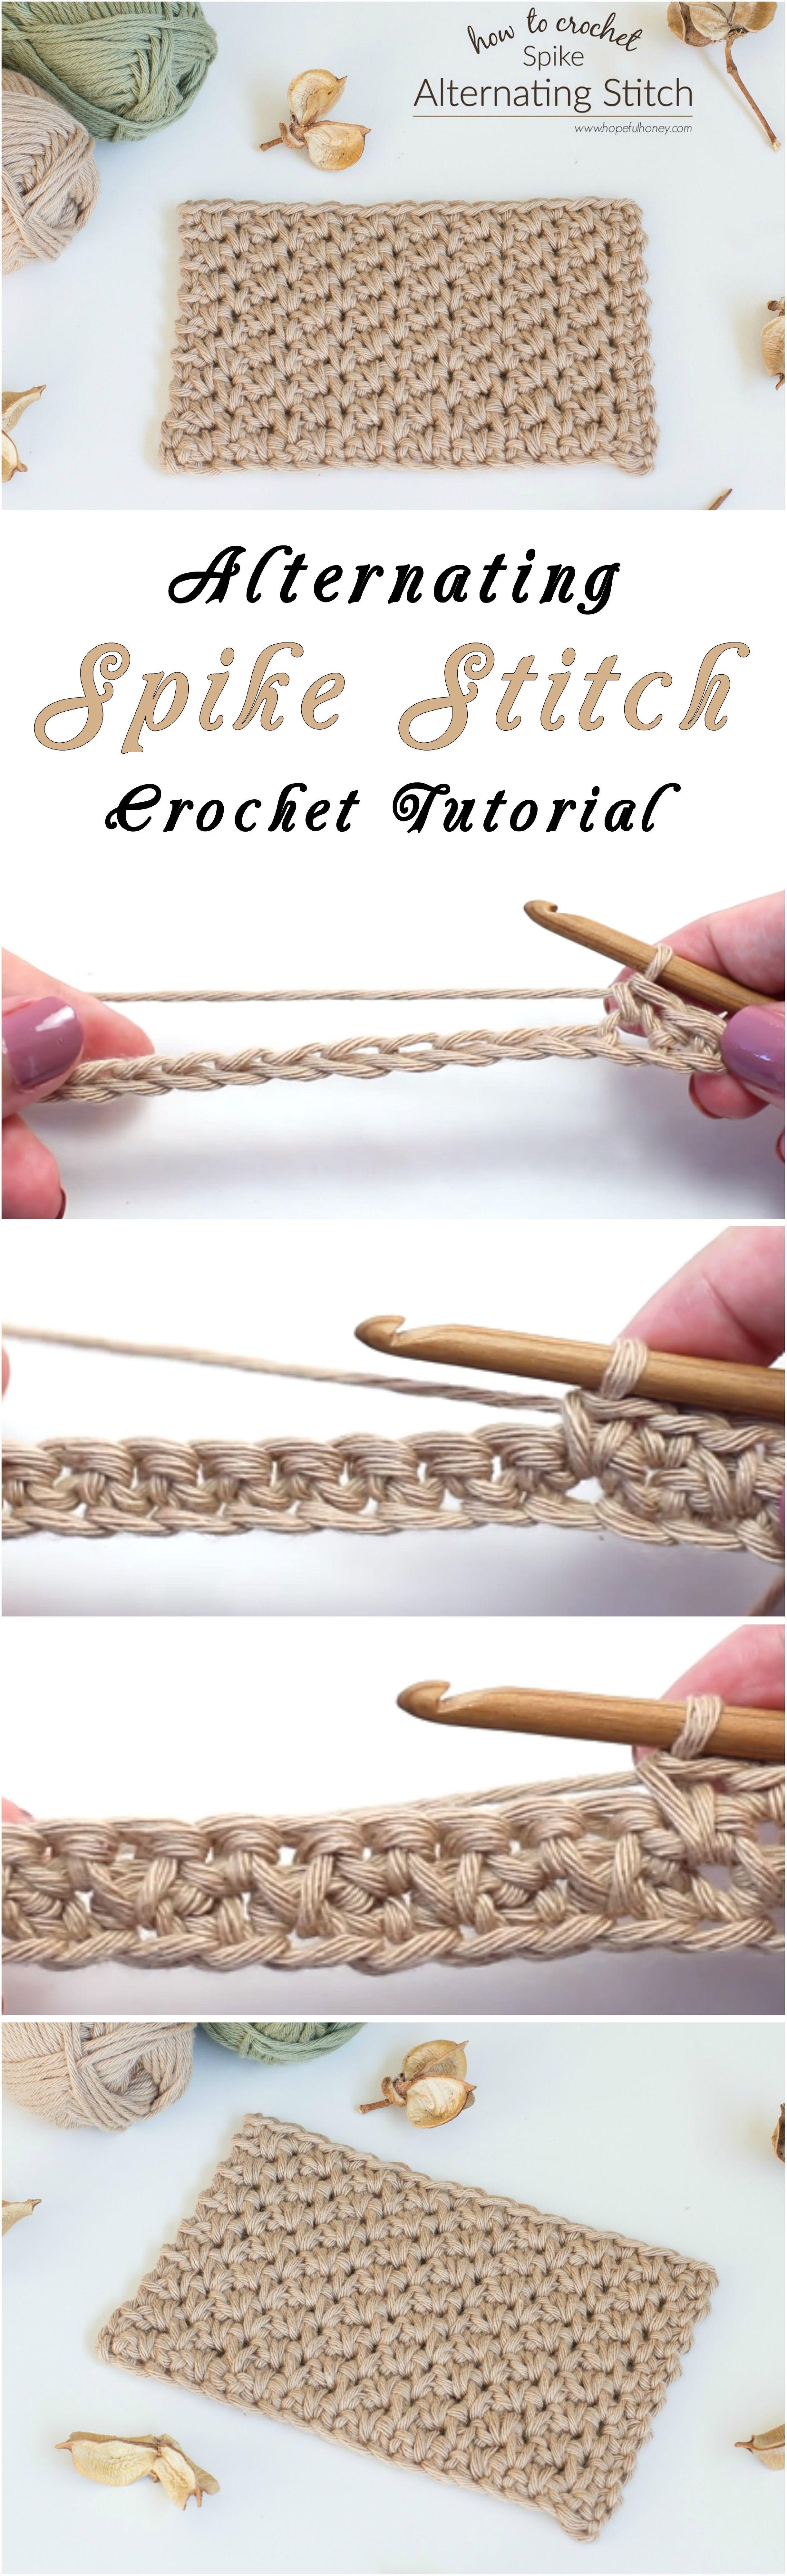 Alternating Spike Stitch Crochet Tutorial | Crochet - Knitting ...